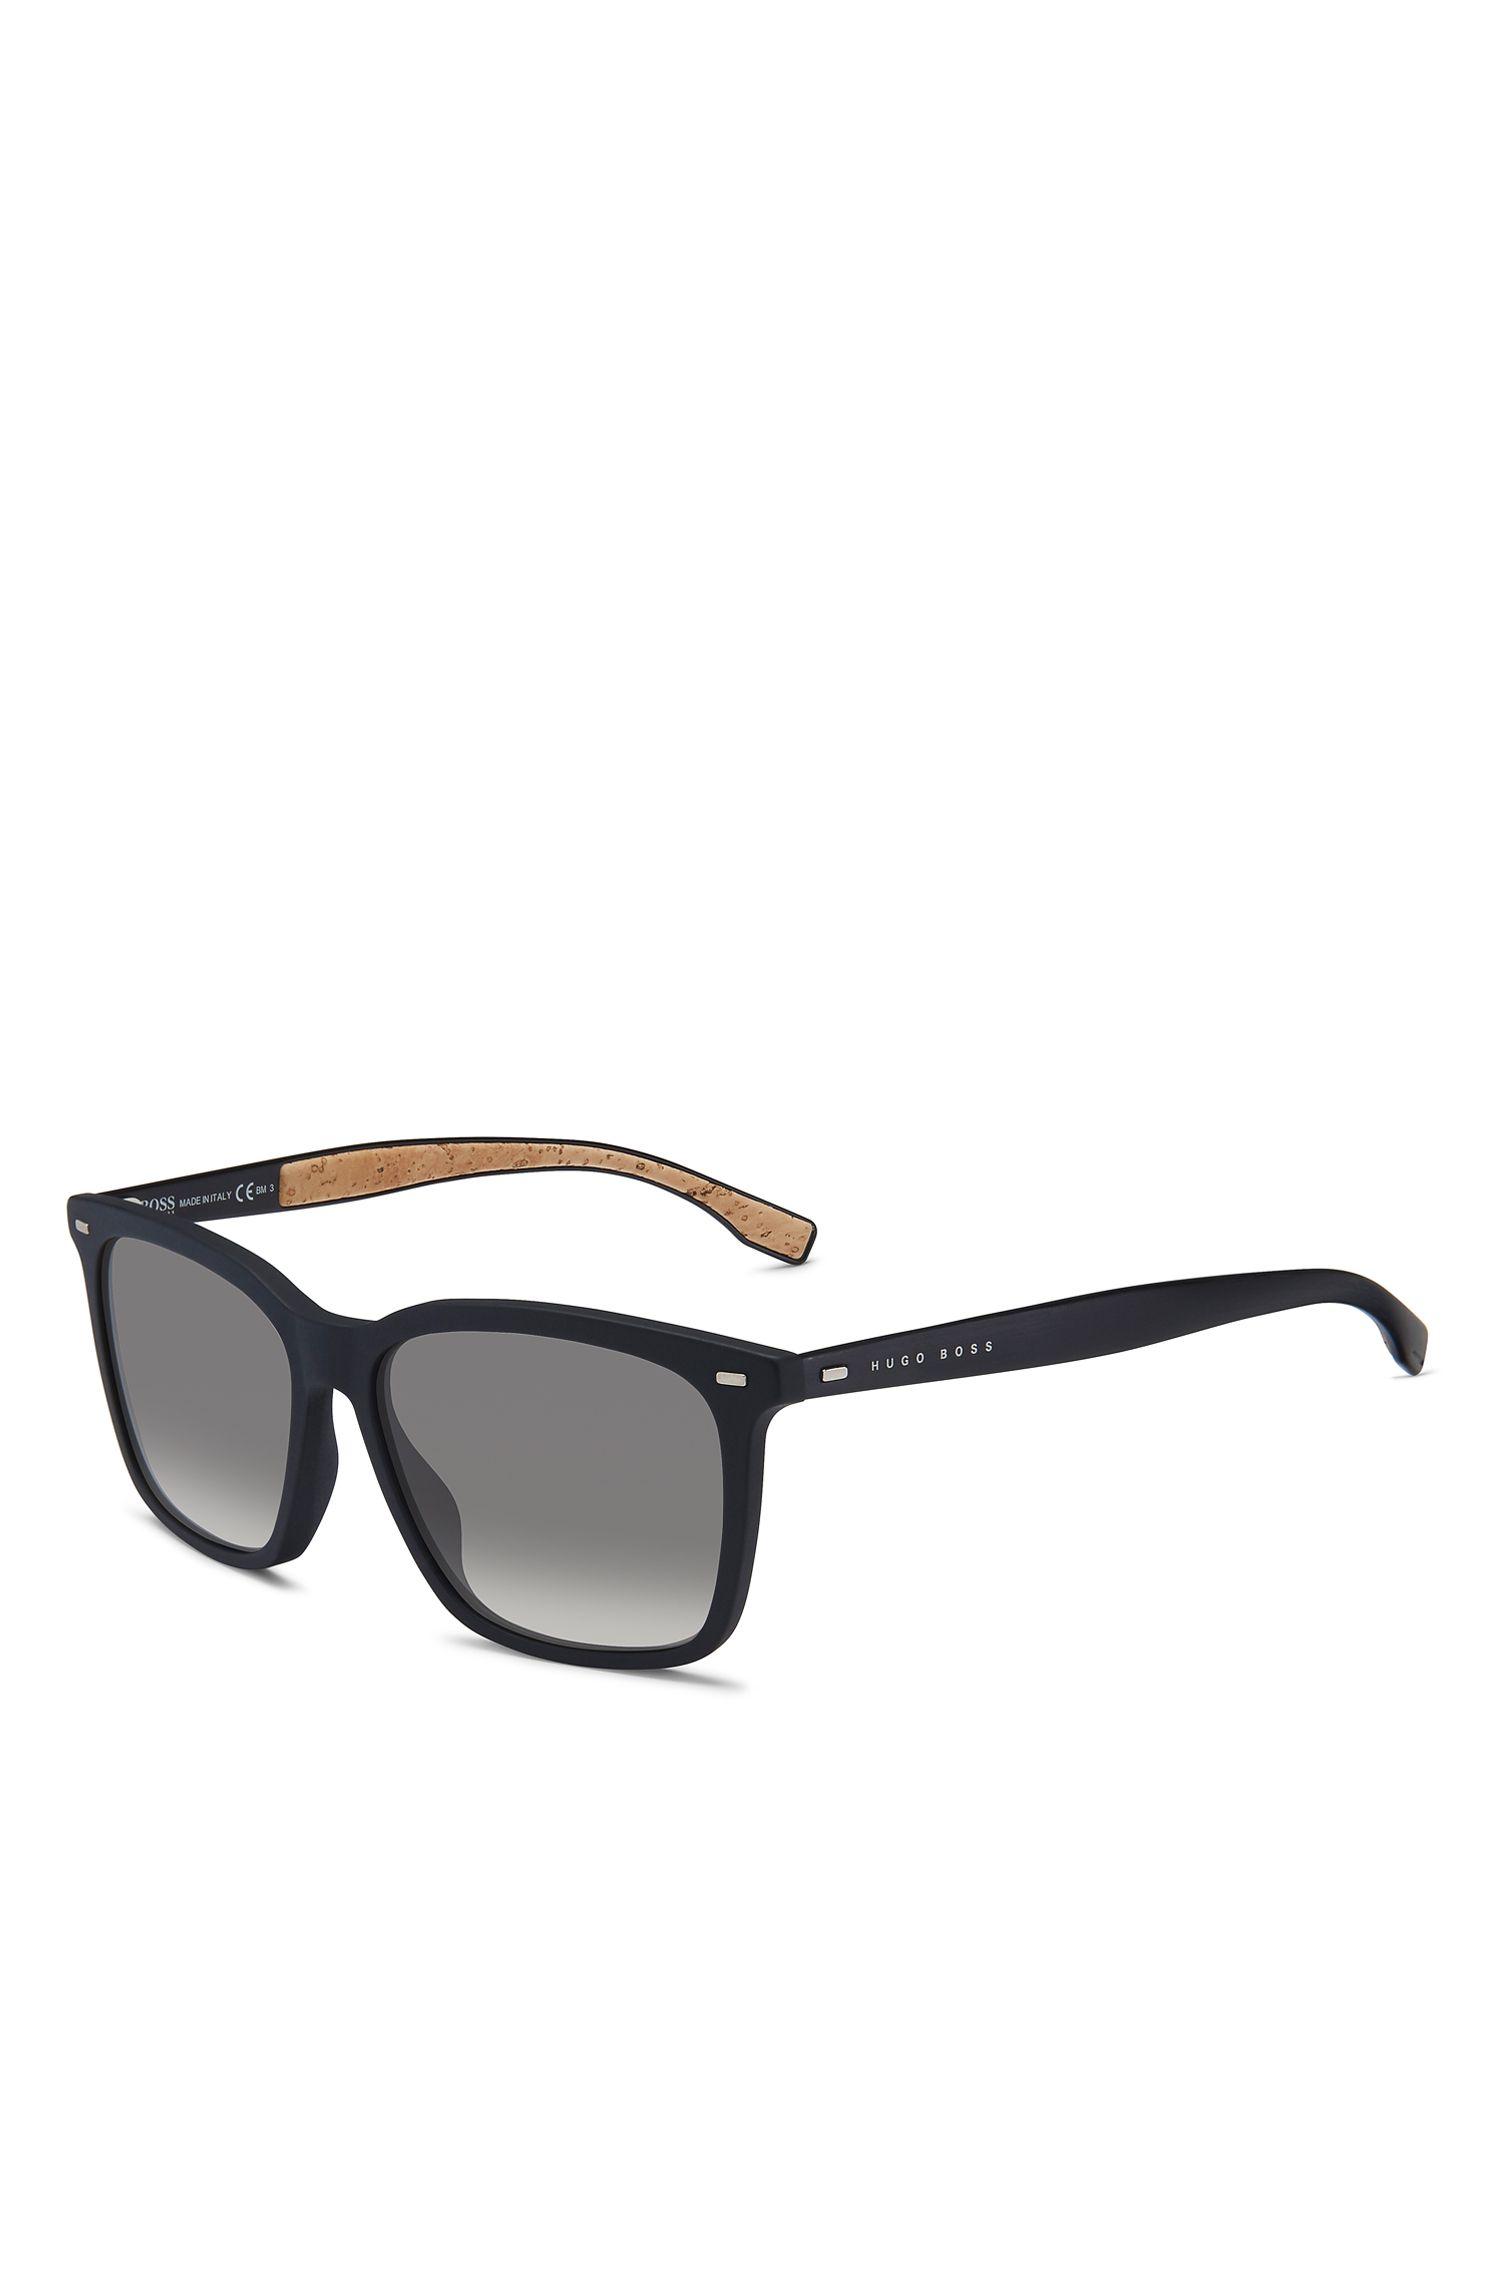 'BOSS 0883S'   Black Acetate Rectangular Sunglasses